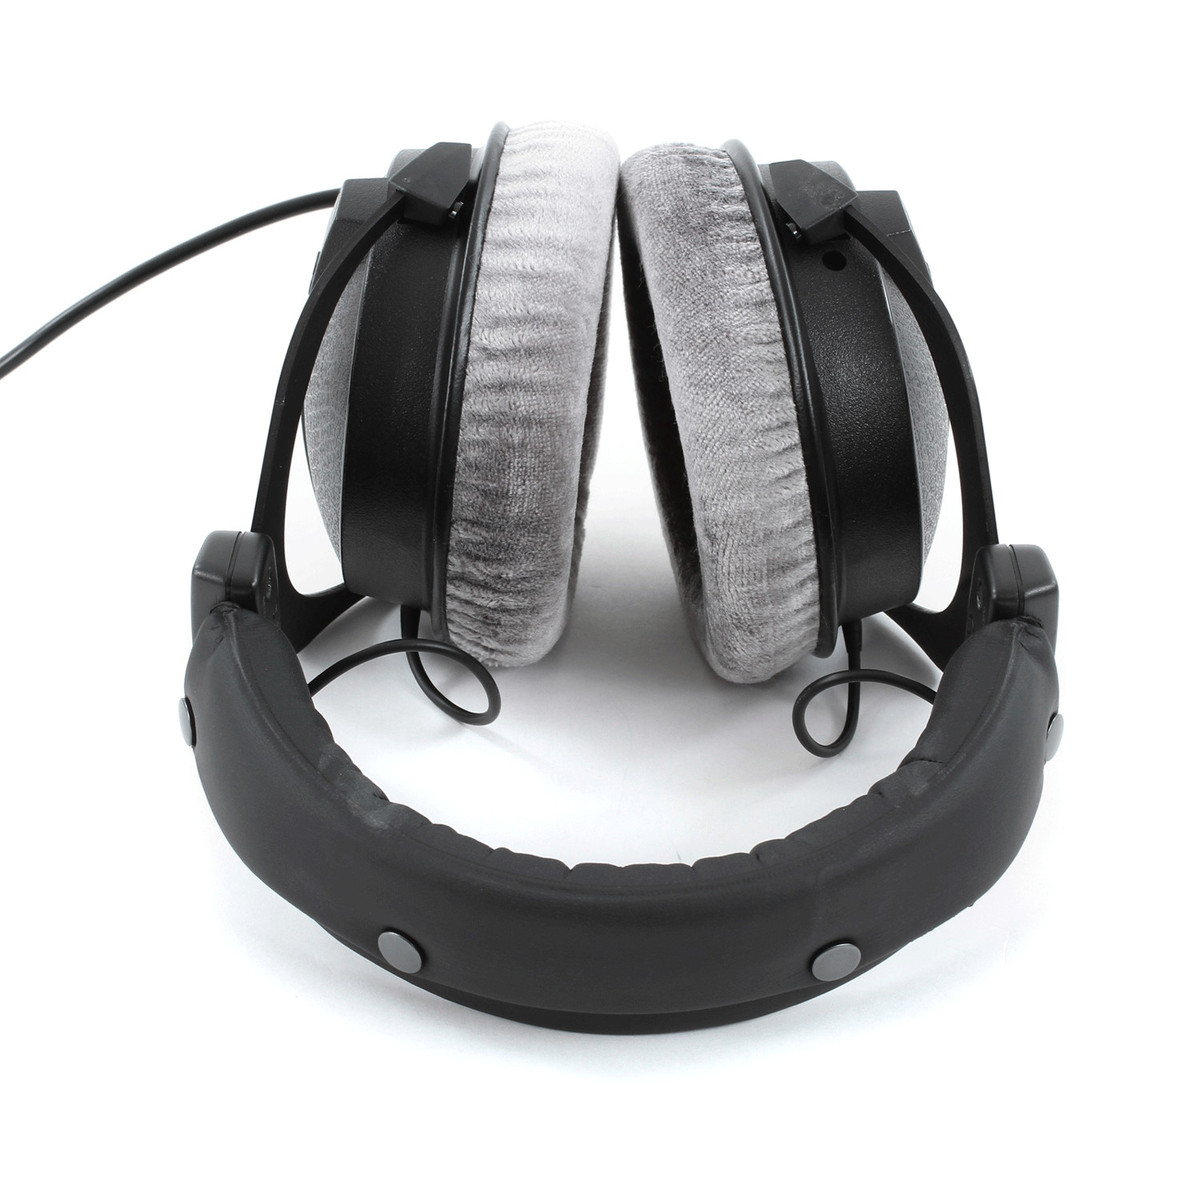 beyerdynamic dt 770 pro headphones 250 ohm box opened at gear4music. Black Bedroom Furniture Sets. Home Design Ideas